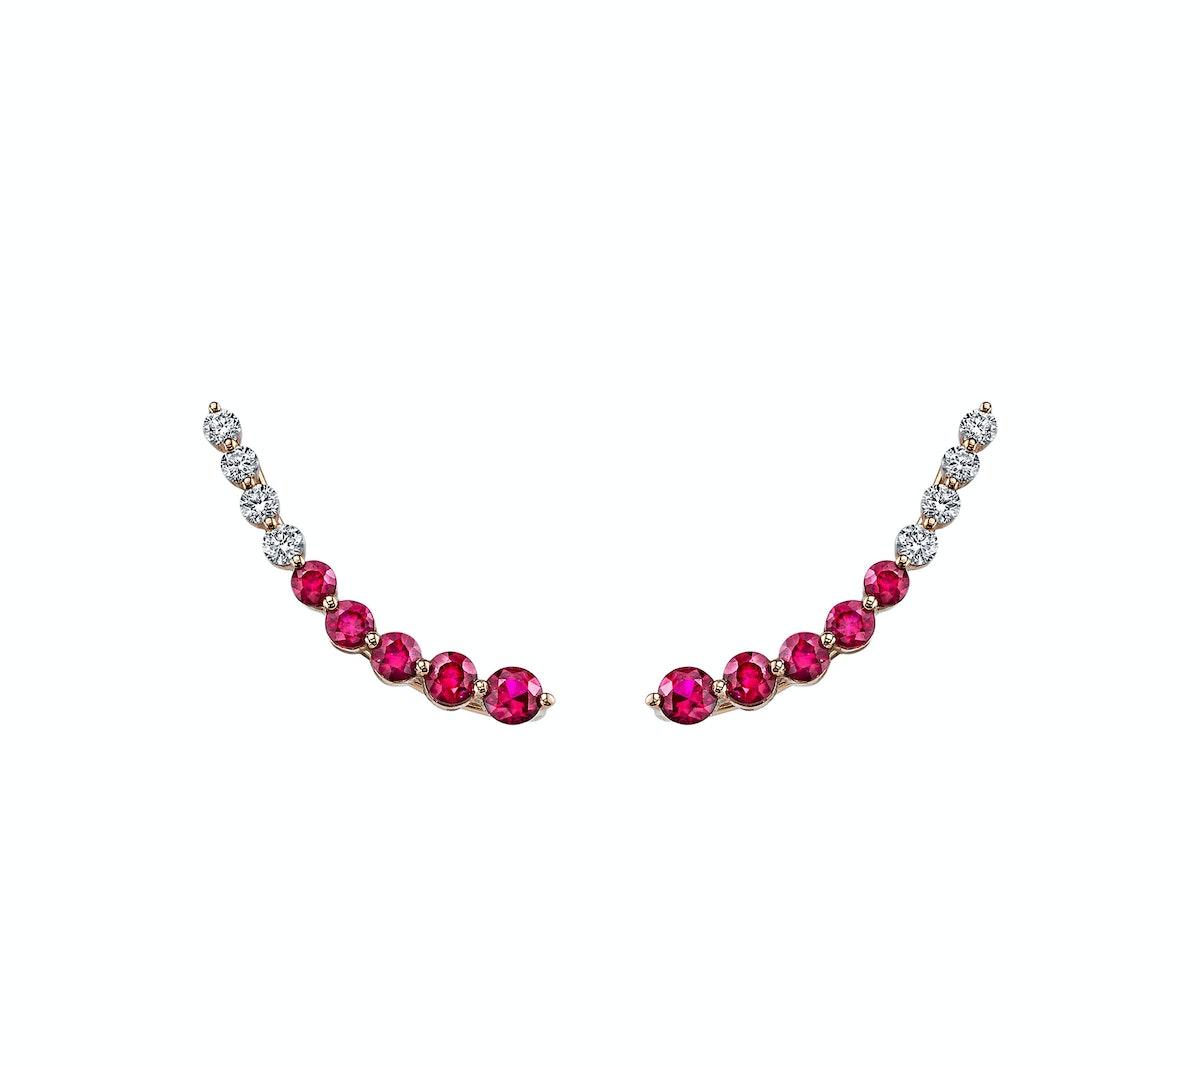 Anita Ko 18k rose gold, ruby, and diamond earrings